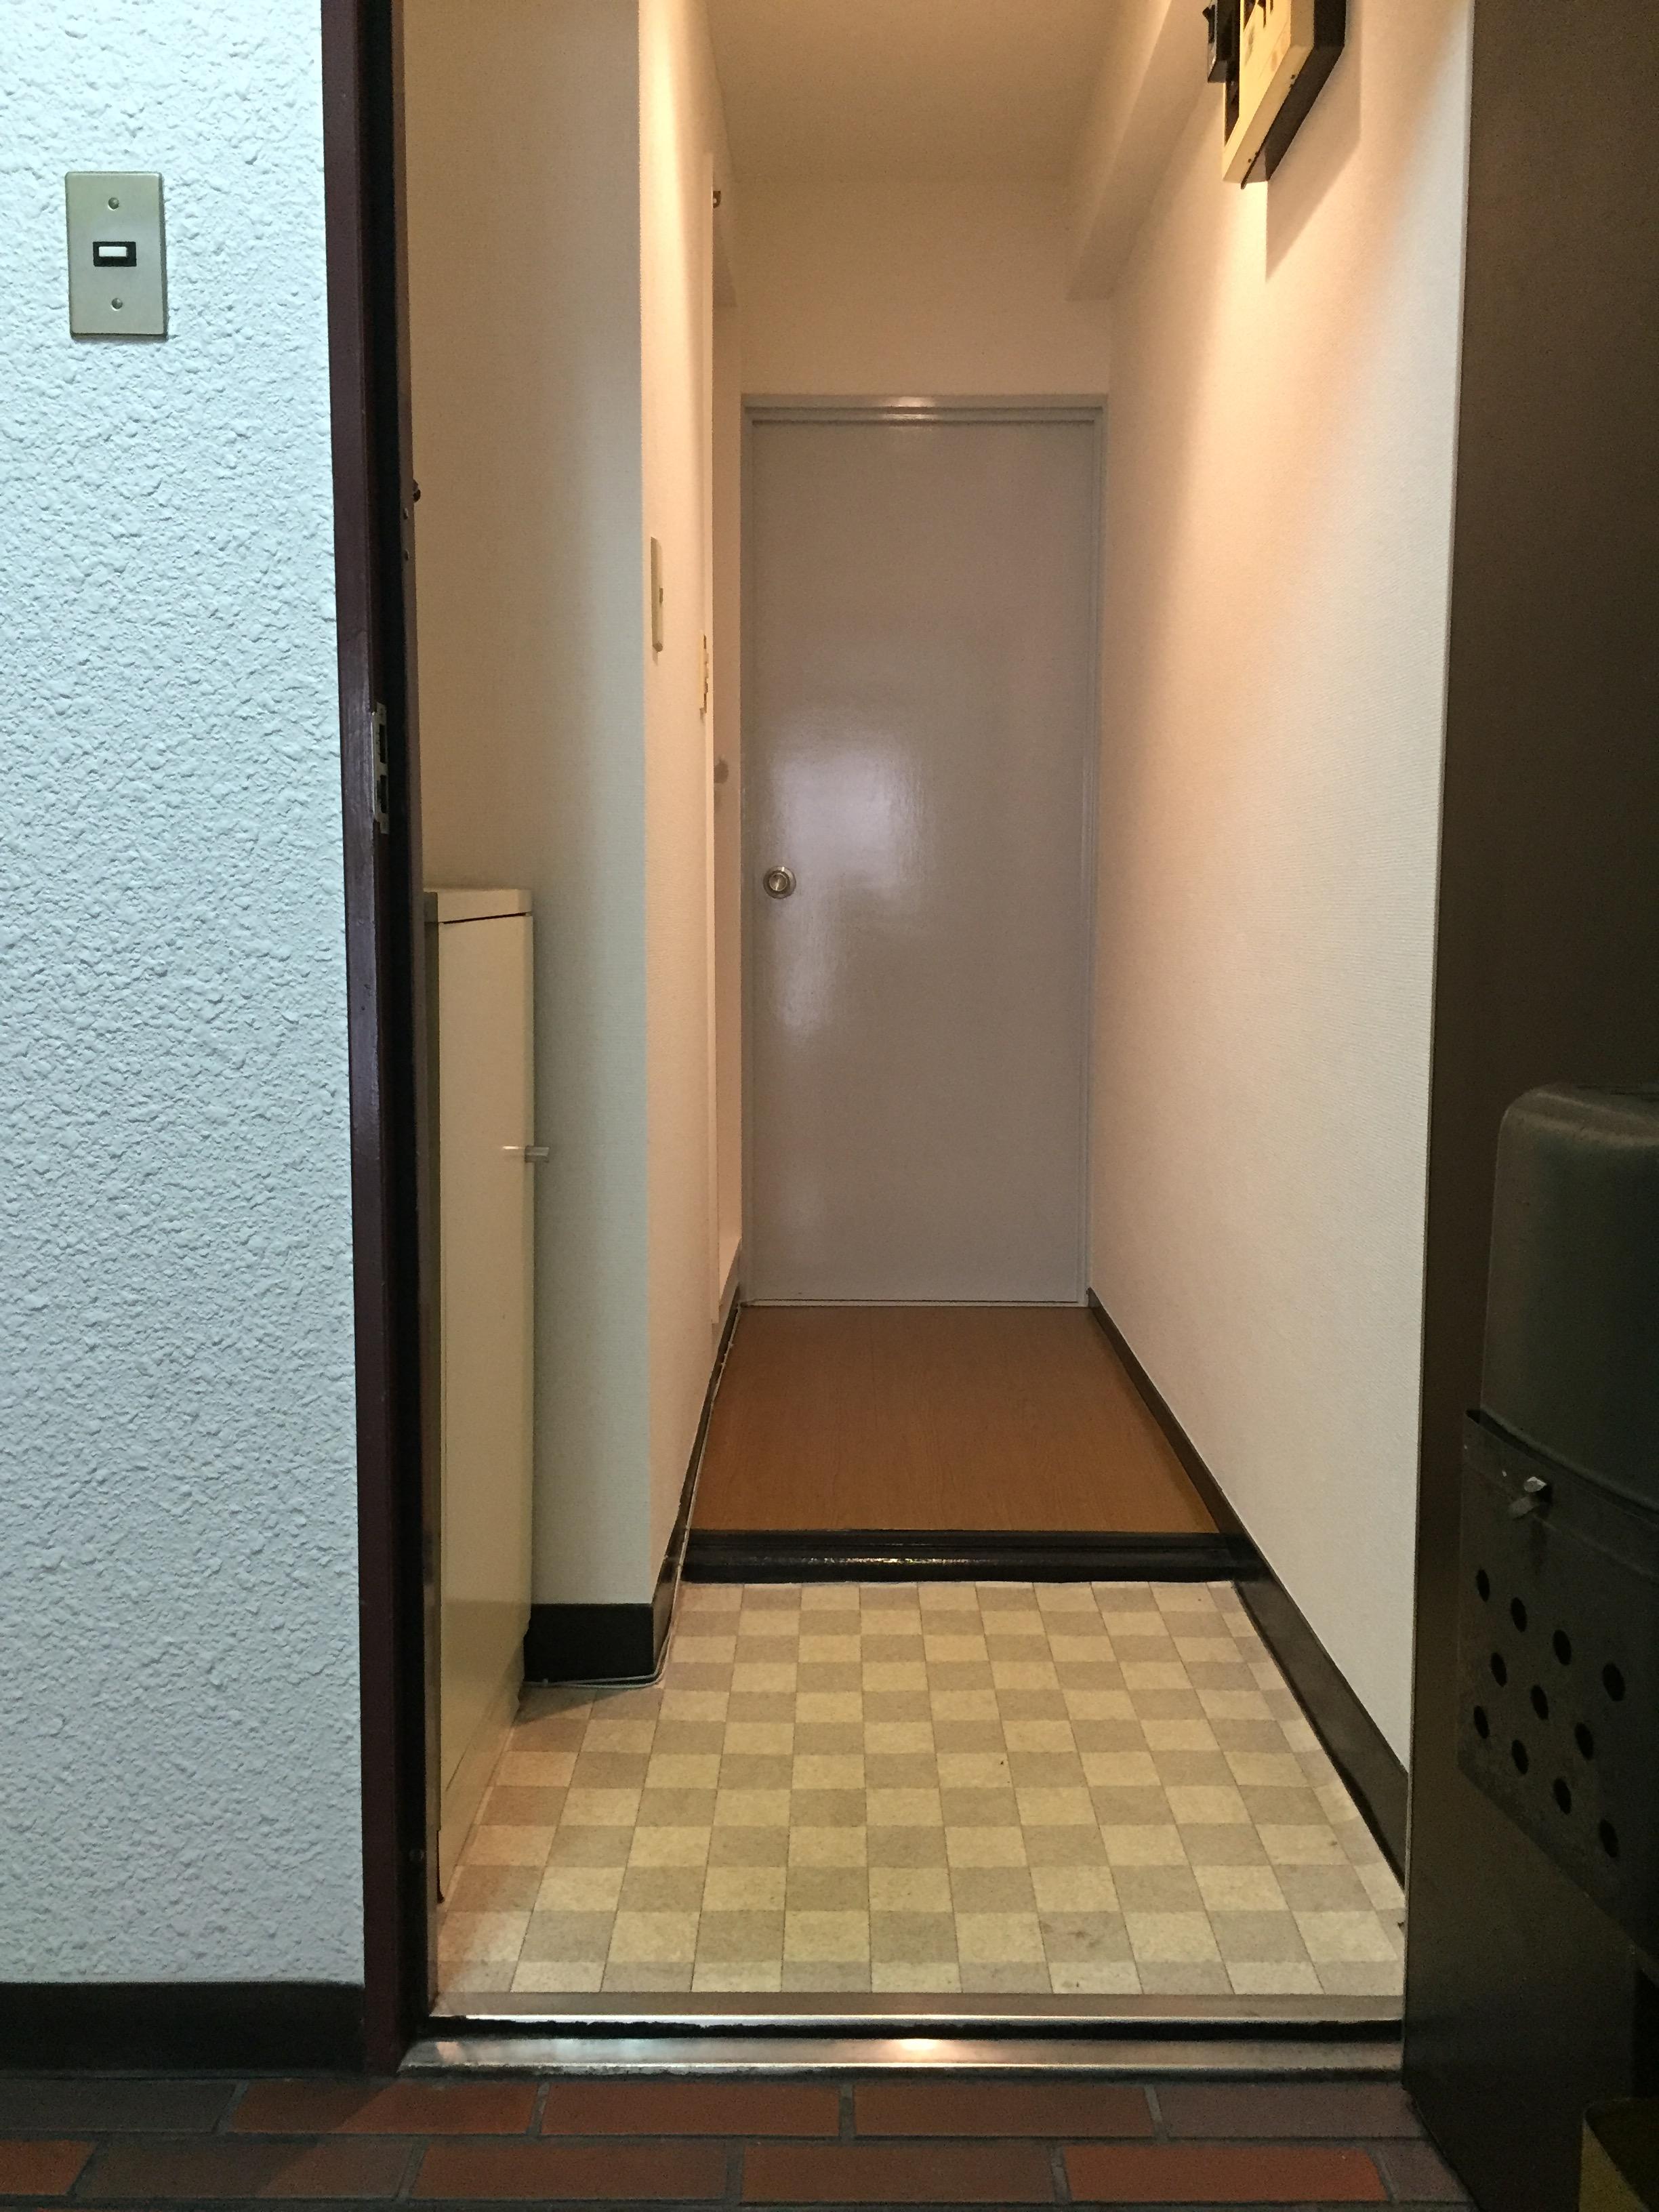 JR山手線「原宿駅」徒歩10分 分譲賃貸マンション 1DK 32.18㎡ 事務所相談可 画像3